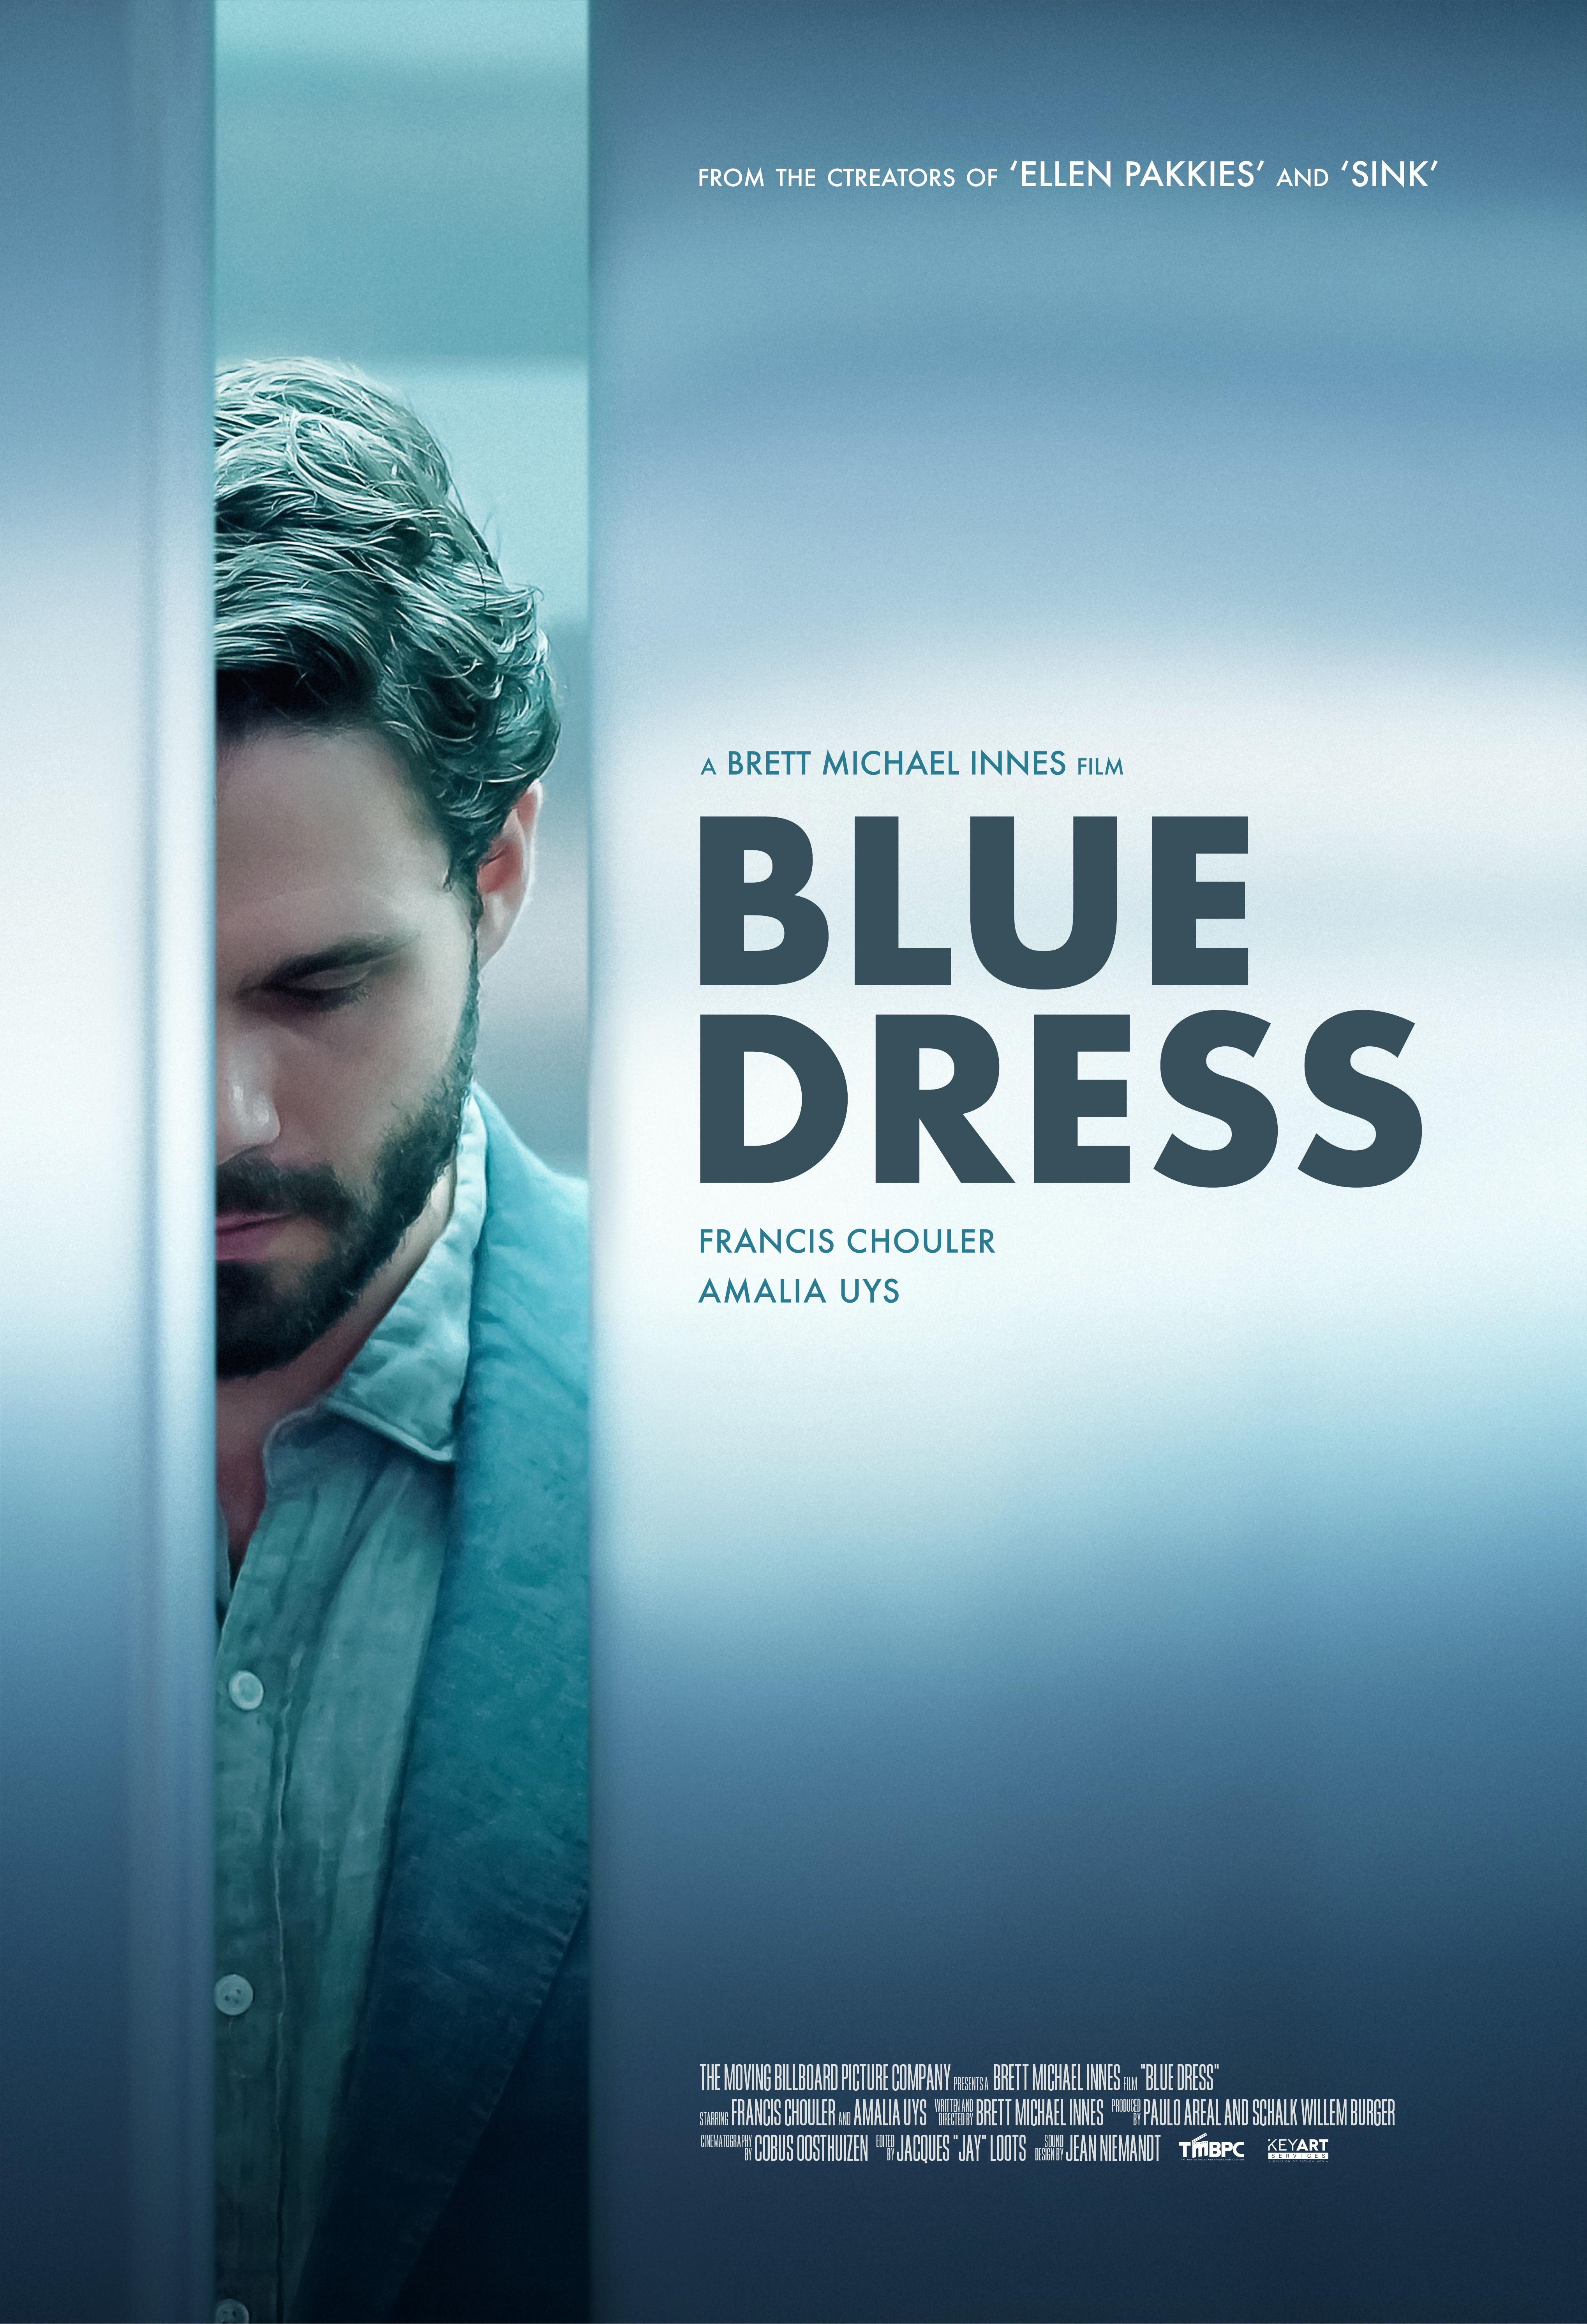 Amalia Uys brett michael innes – blue dress